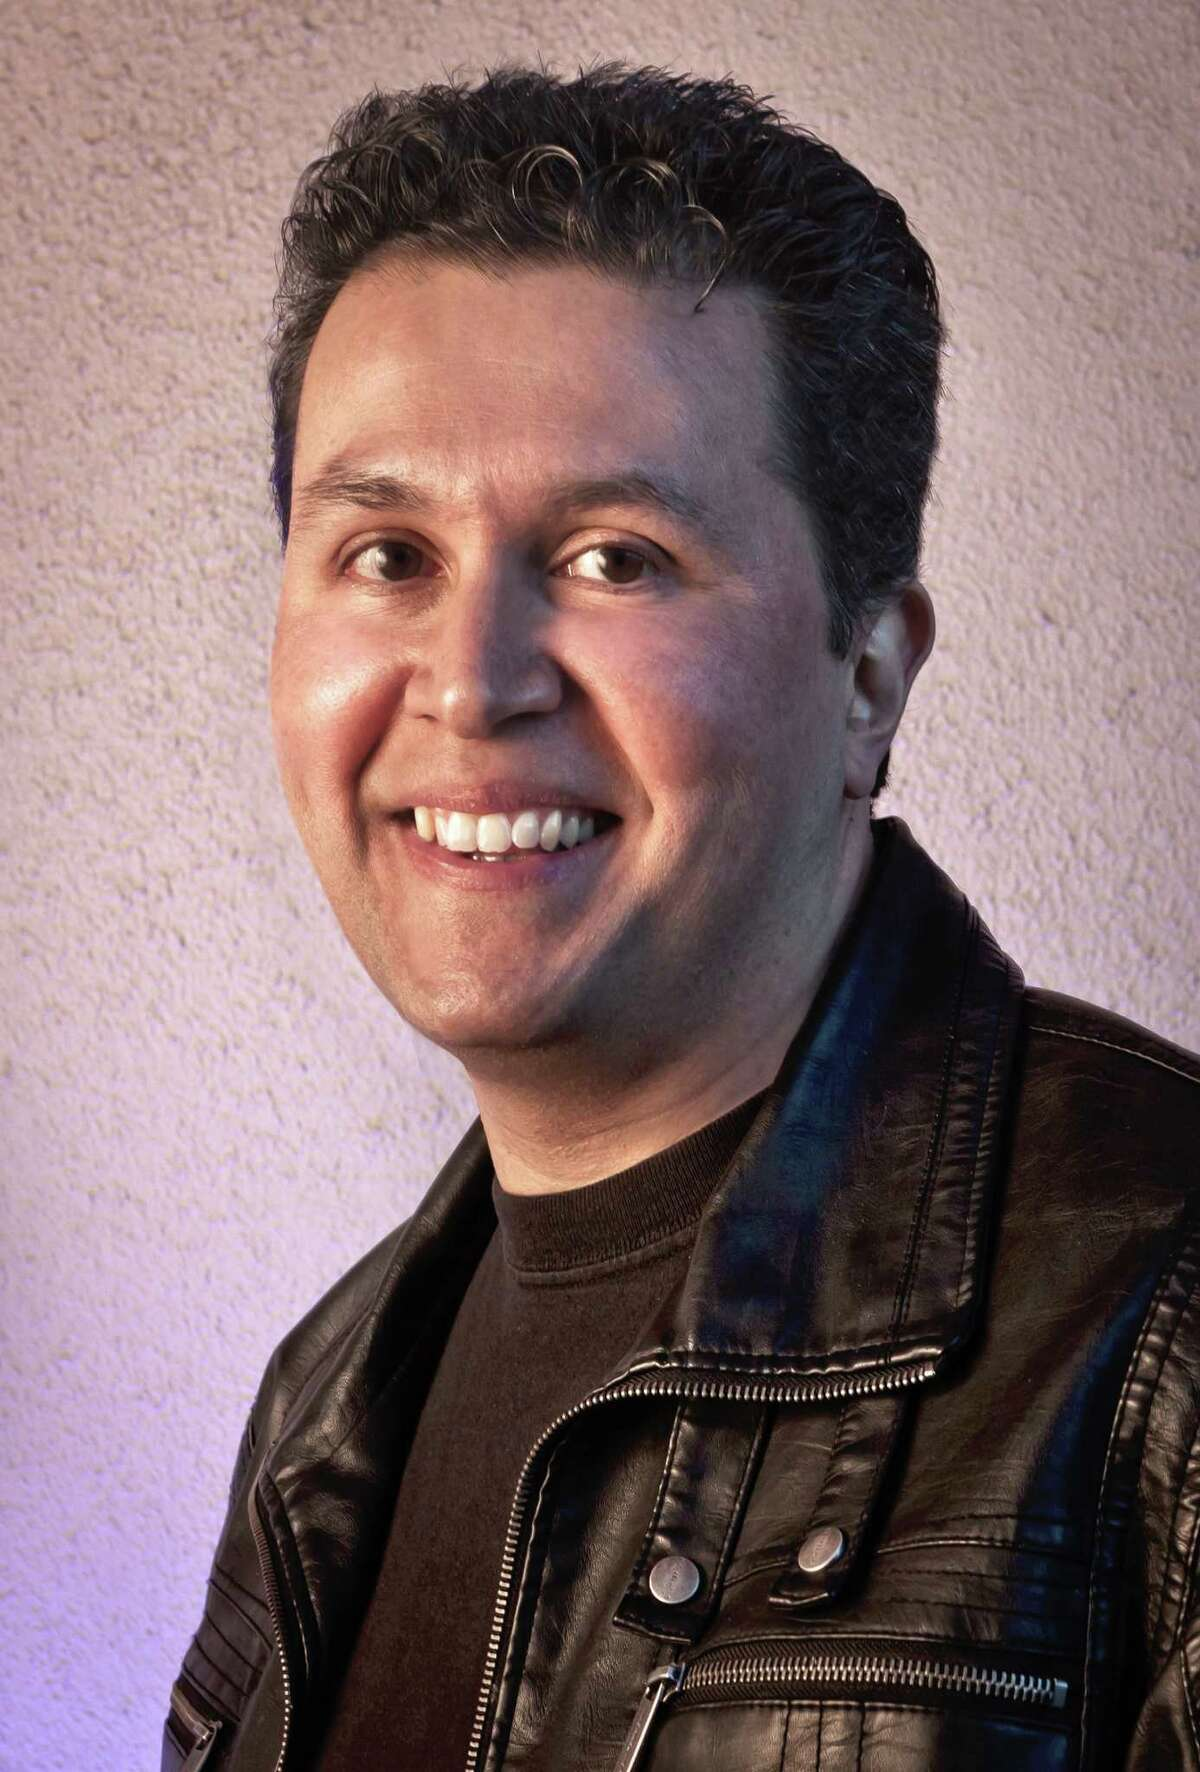 San Antonio fantasy and science fiction artist John Picacio, winner of the 2012 Hugo Award for Best Professional Artist.